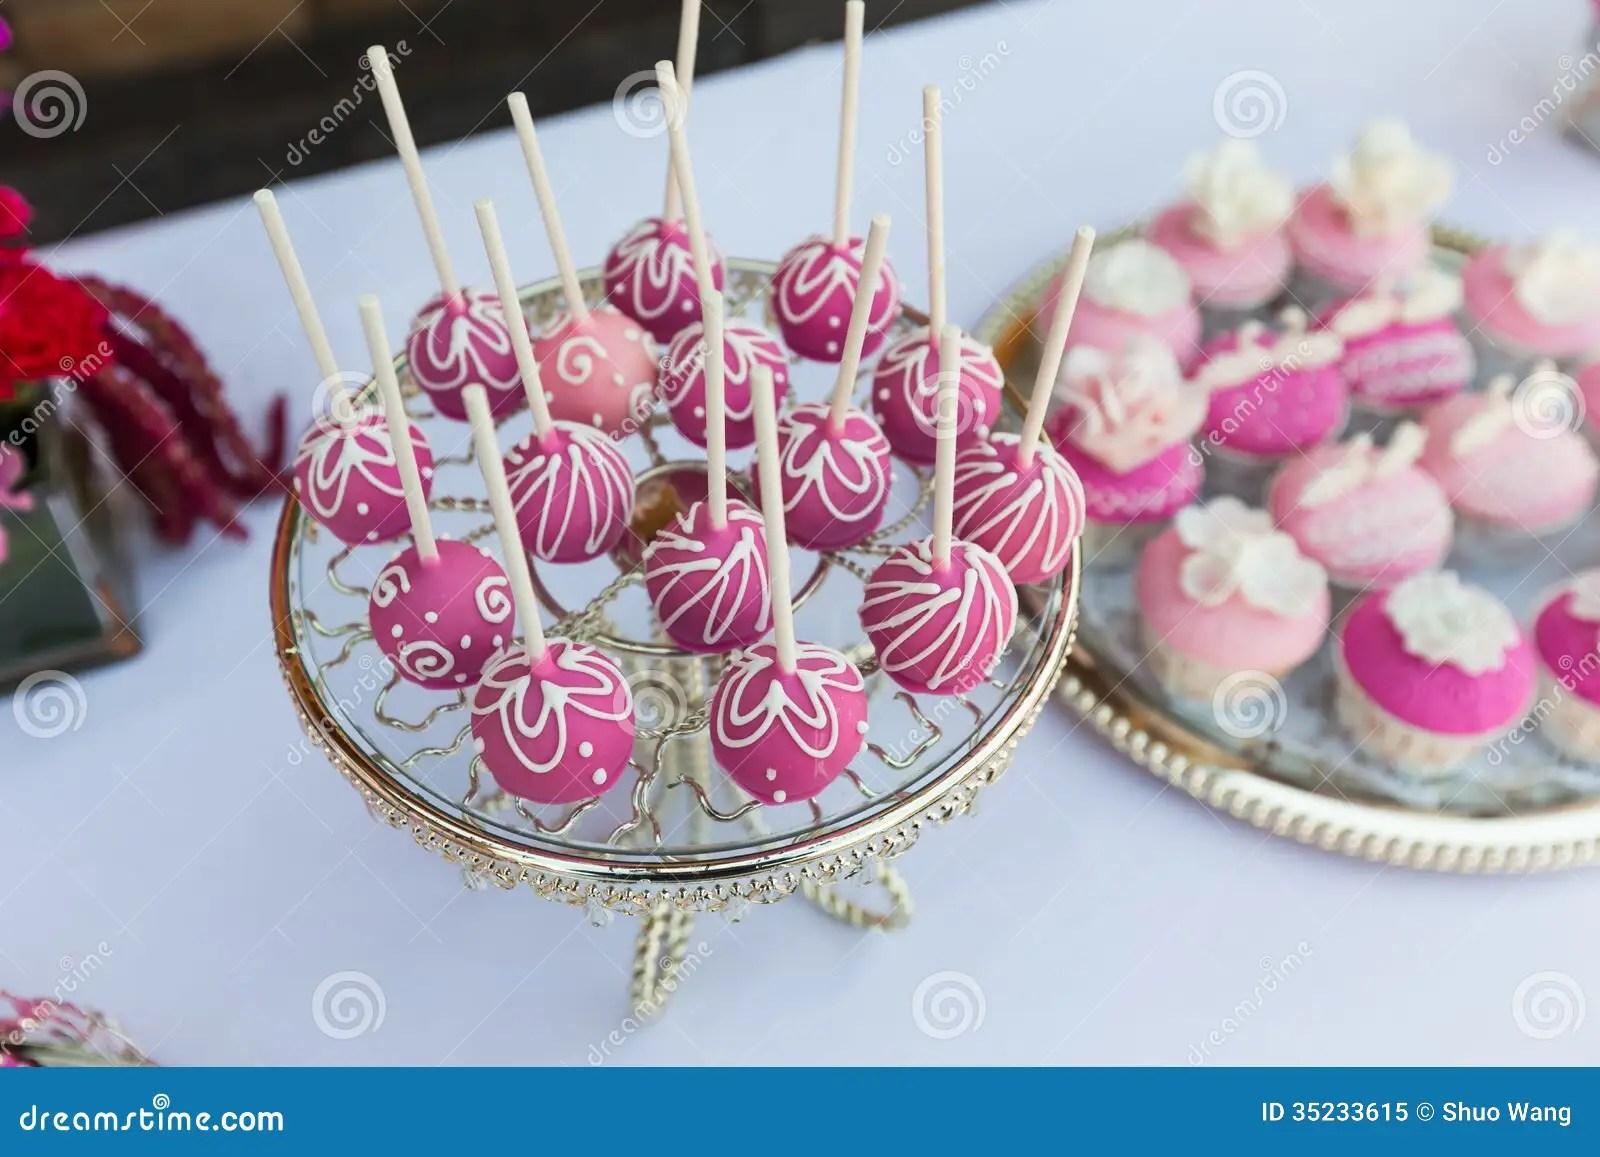 wedding cake pops wedding cake pops Cake pops and cupcakes Royalty Free Stock Photo